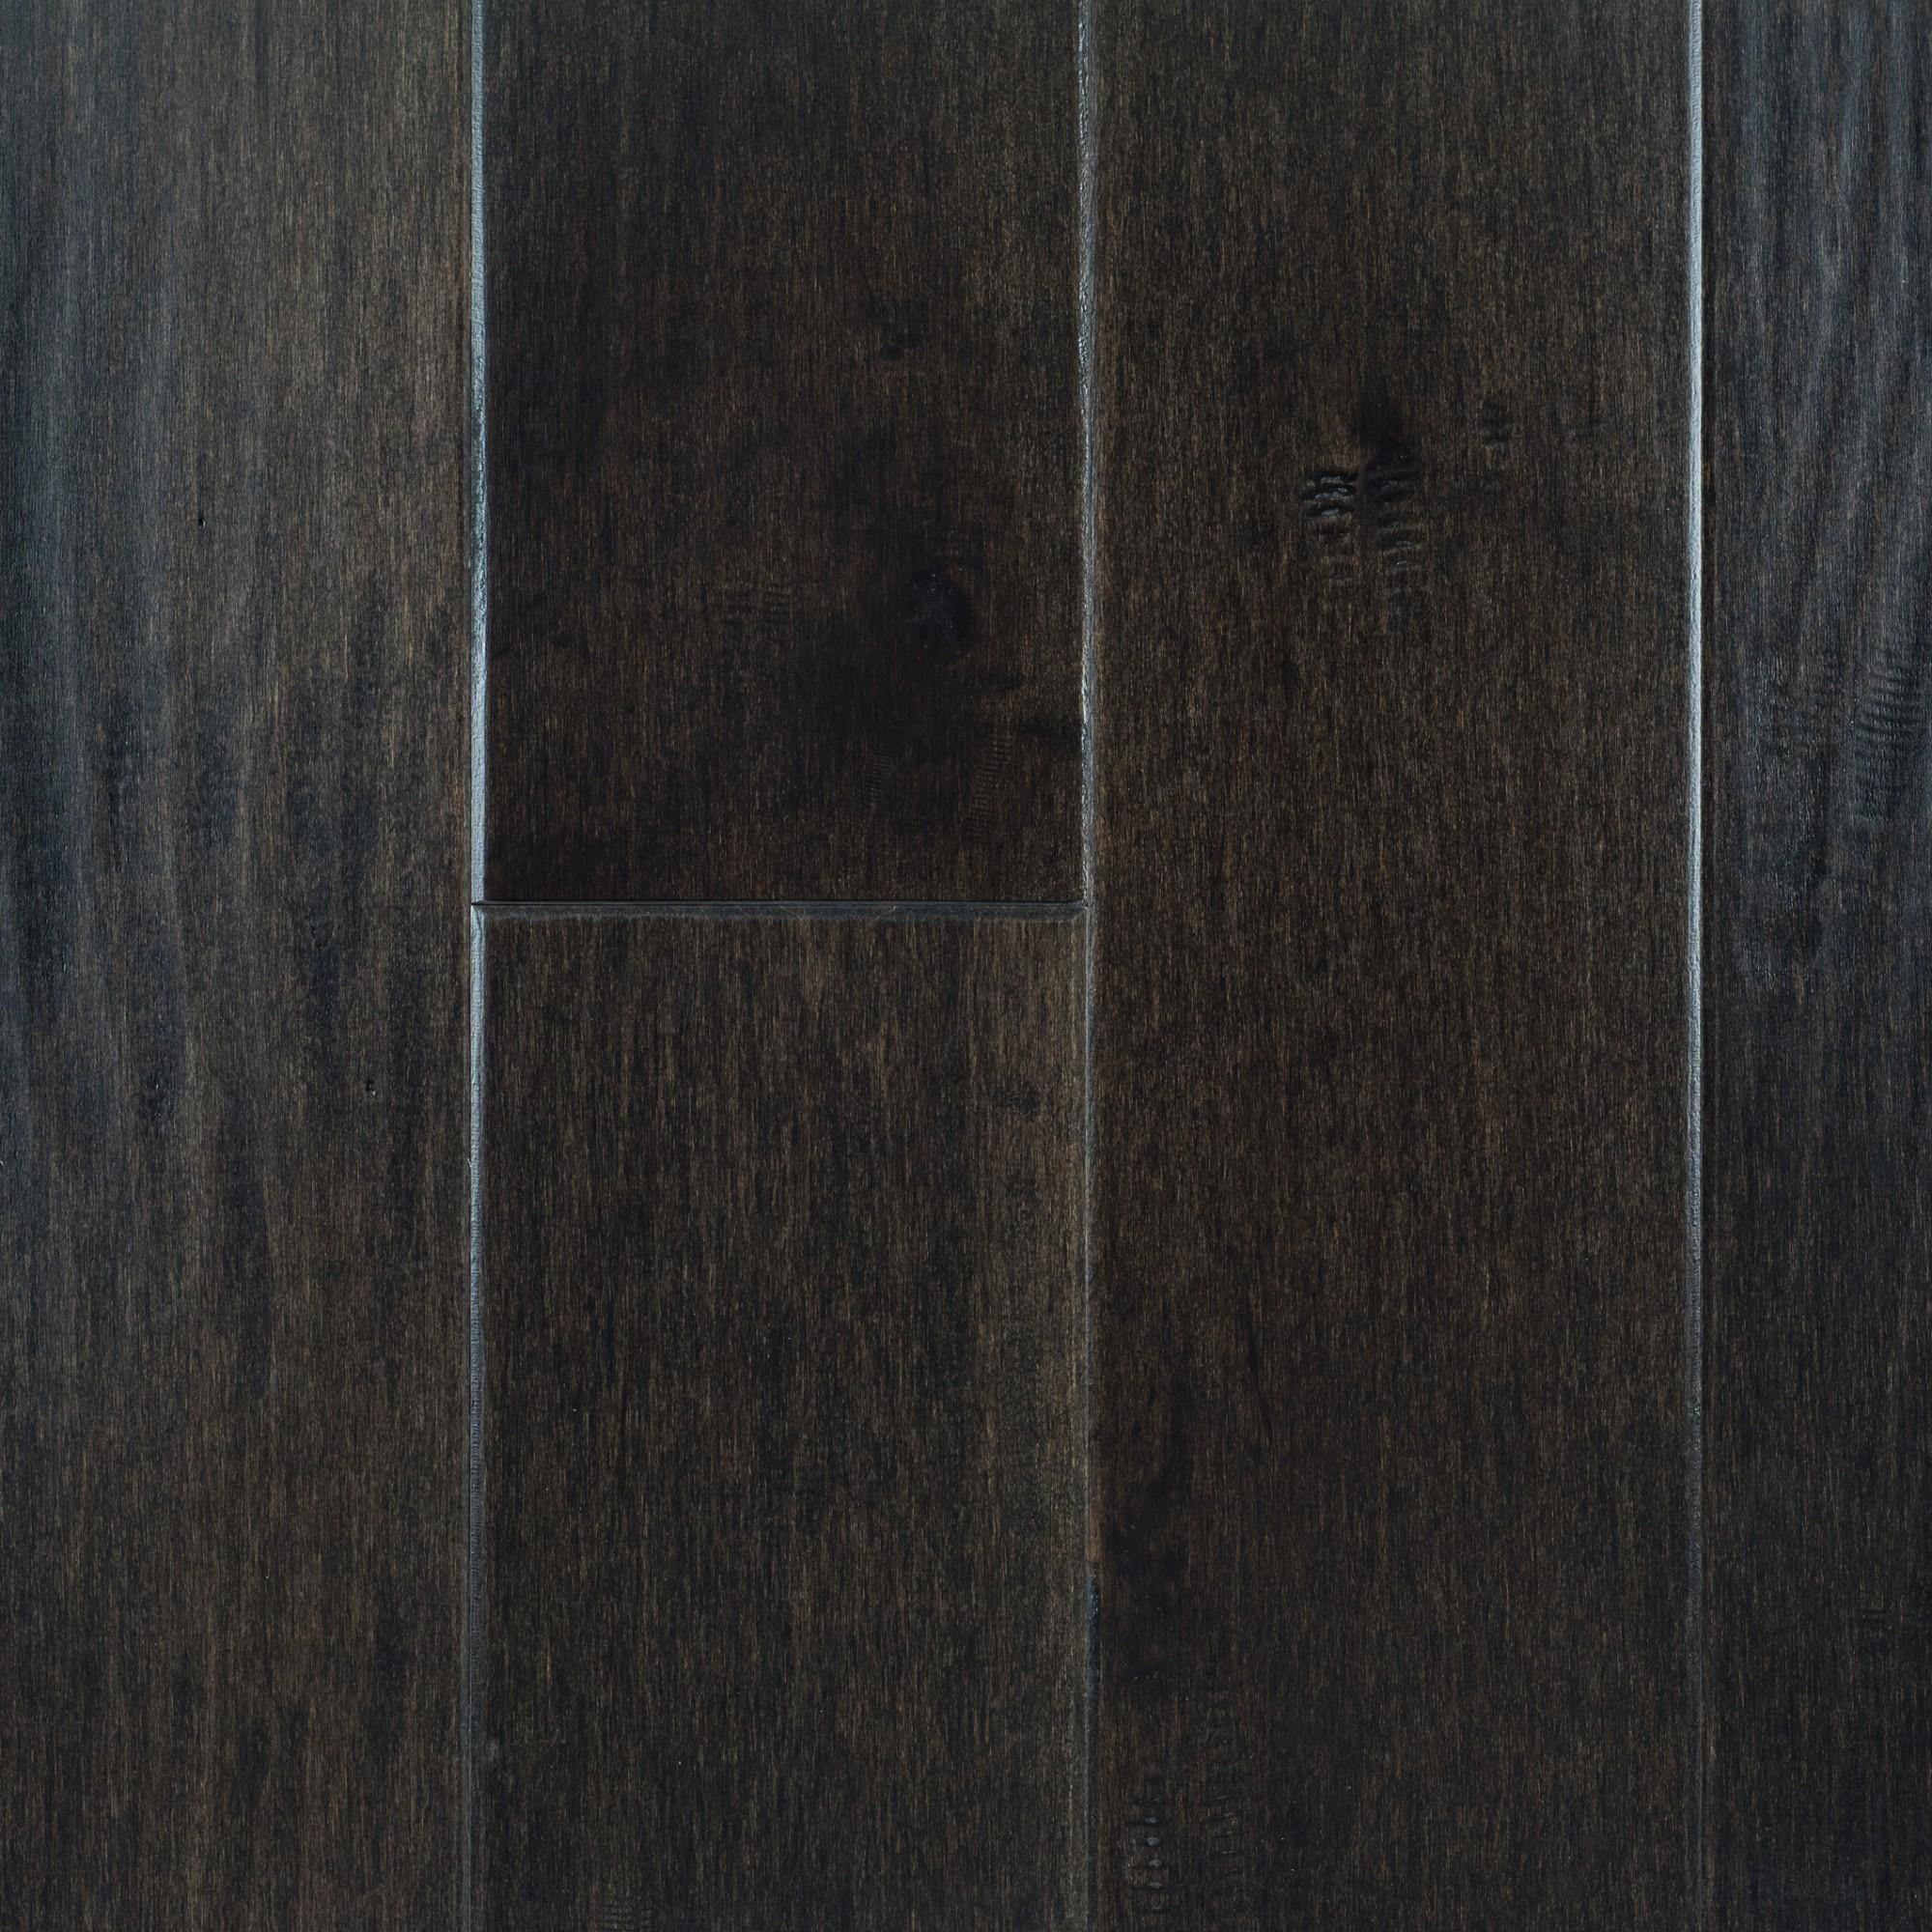 Hand Scraped Maple Taboo  Vintage Hardwood Flooring and